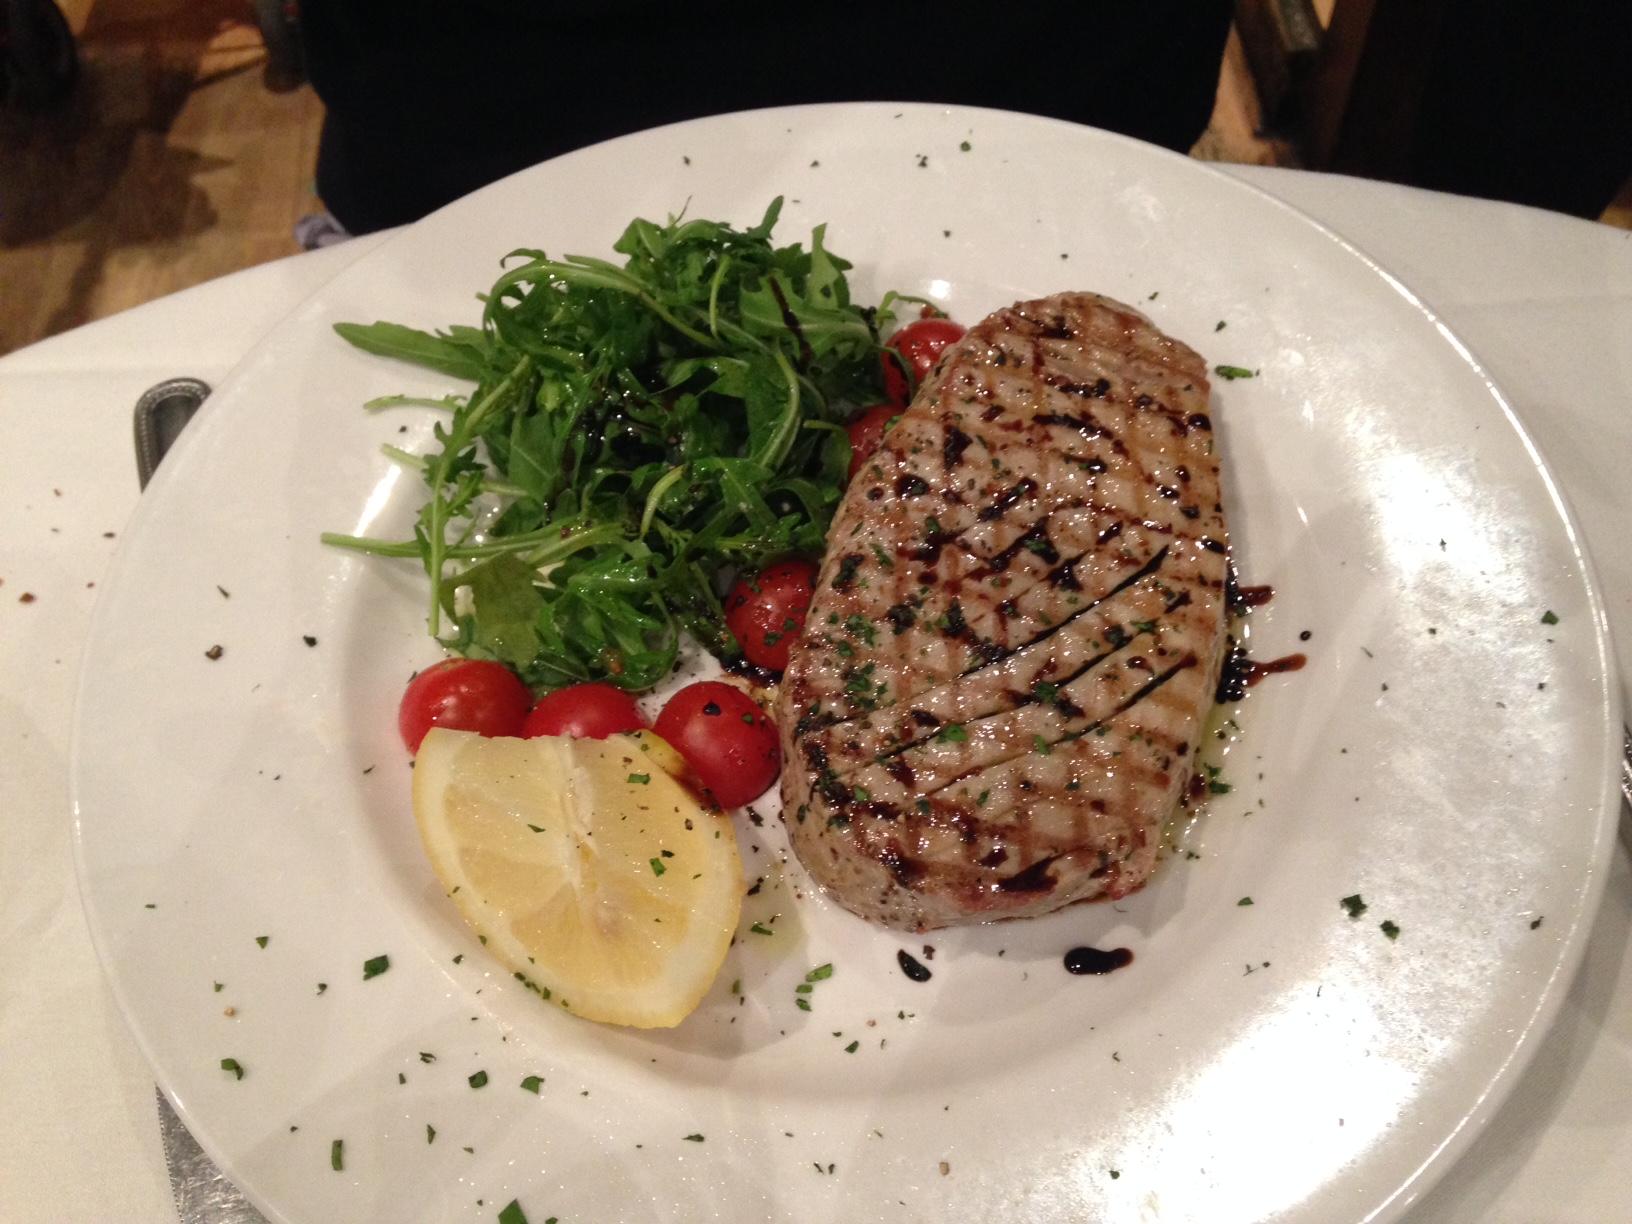 Dinner – londonismyplayground